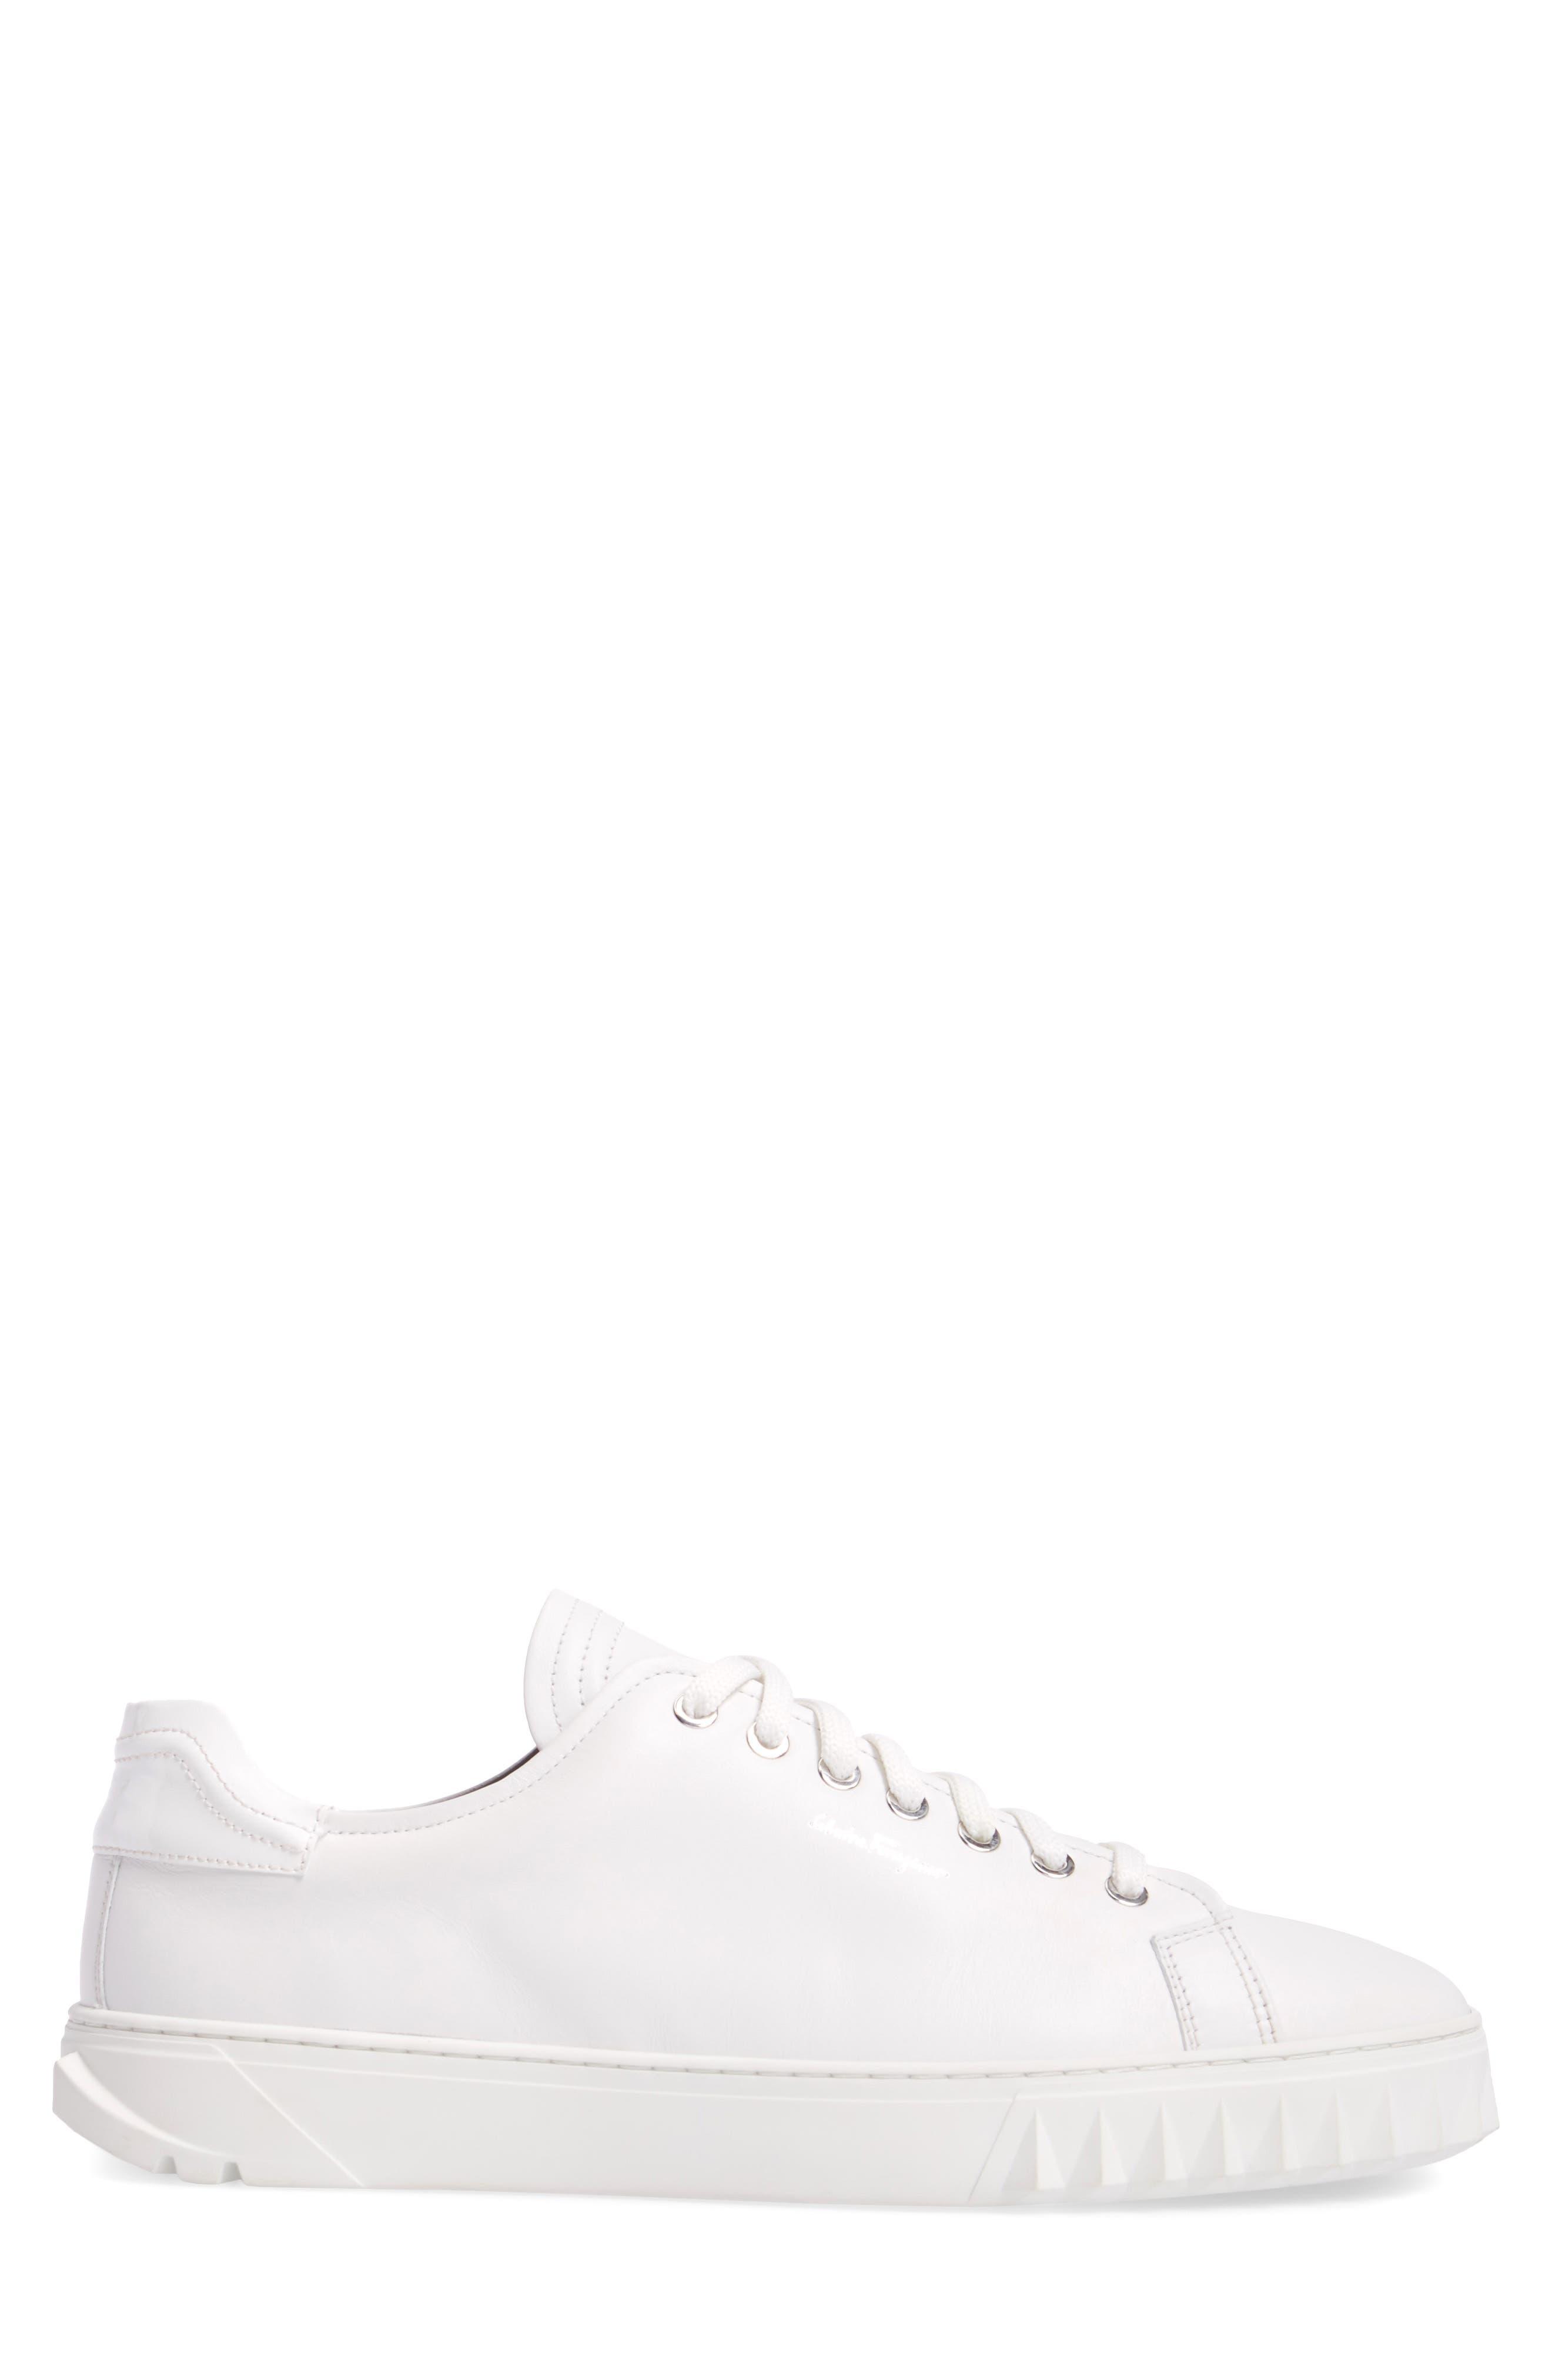 Cube Sneaker,                             Alternate thumbnail 3, color,                             BIANCO